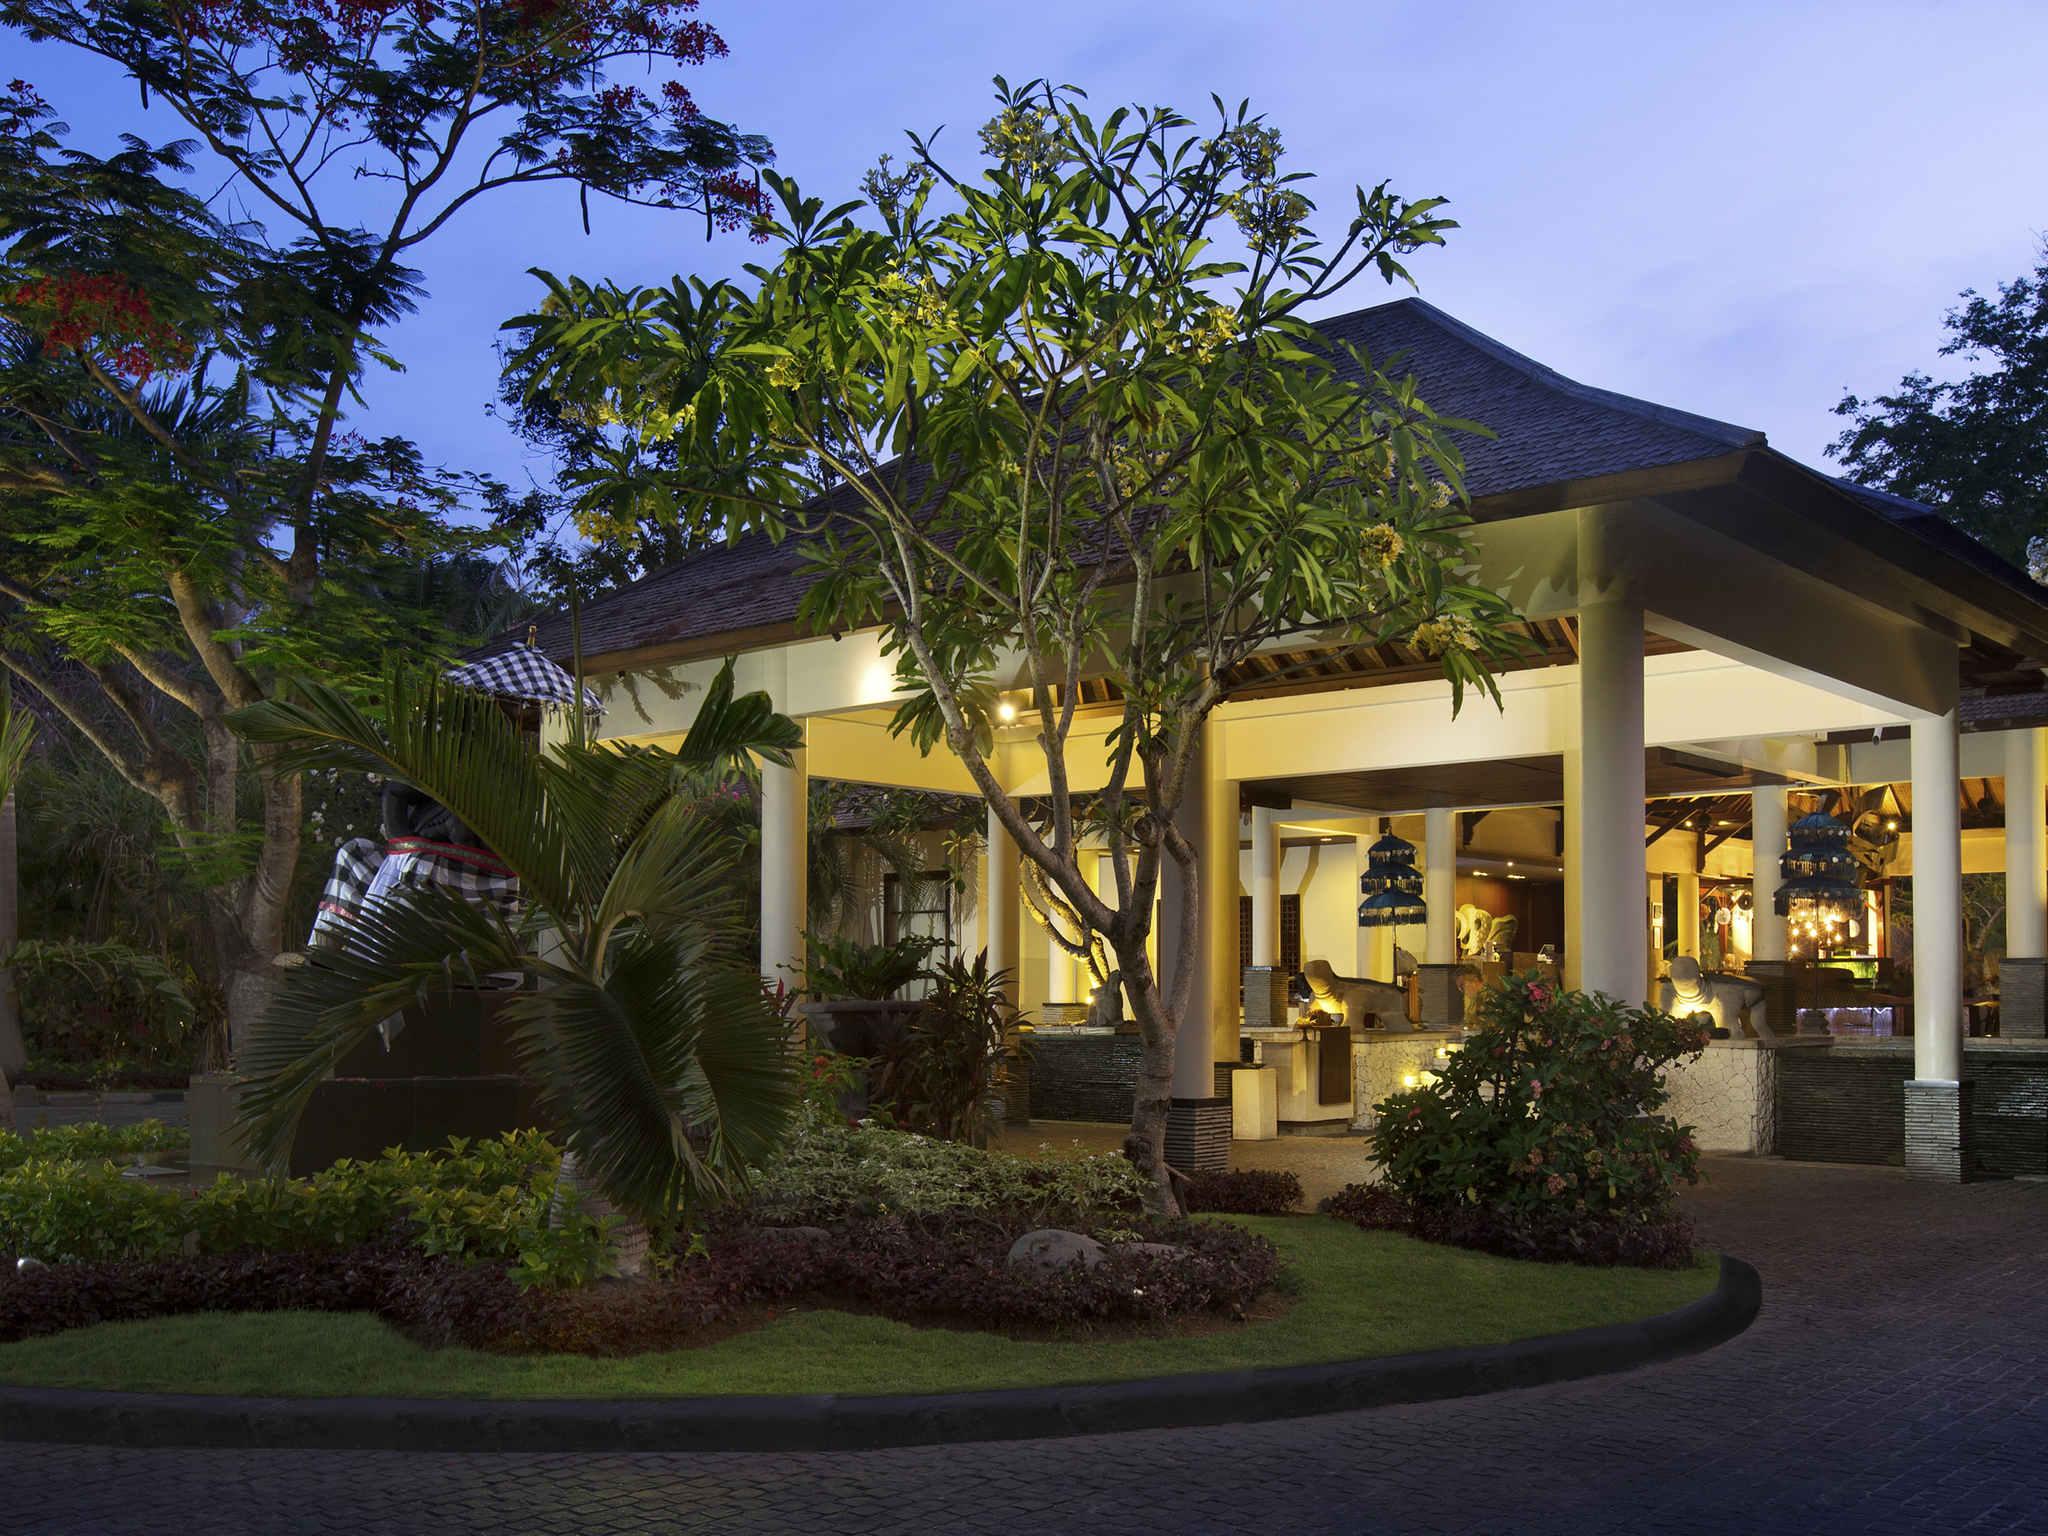 Novotel Bali Nusa Dua Hotel Residences Accorhotels Voucher Value Indonesia